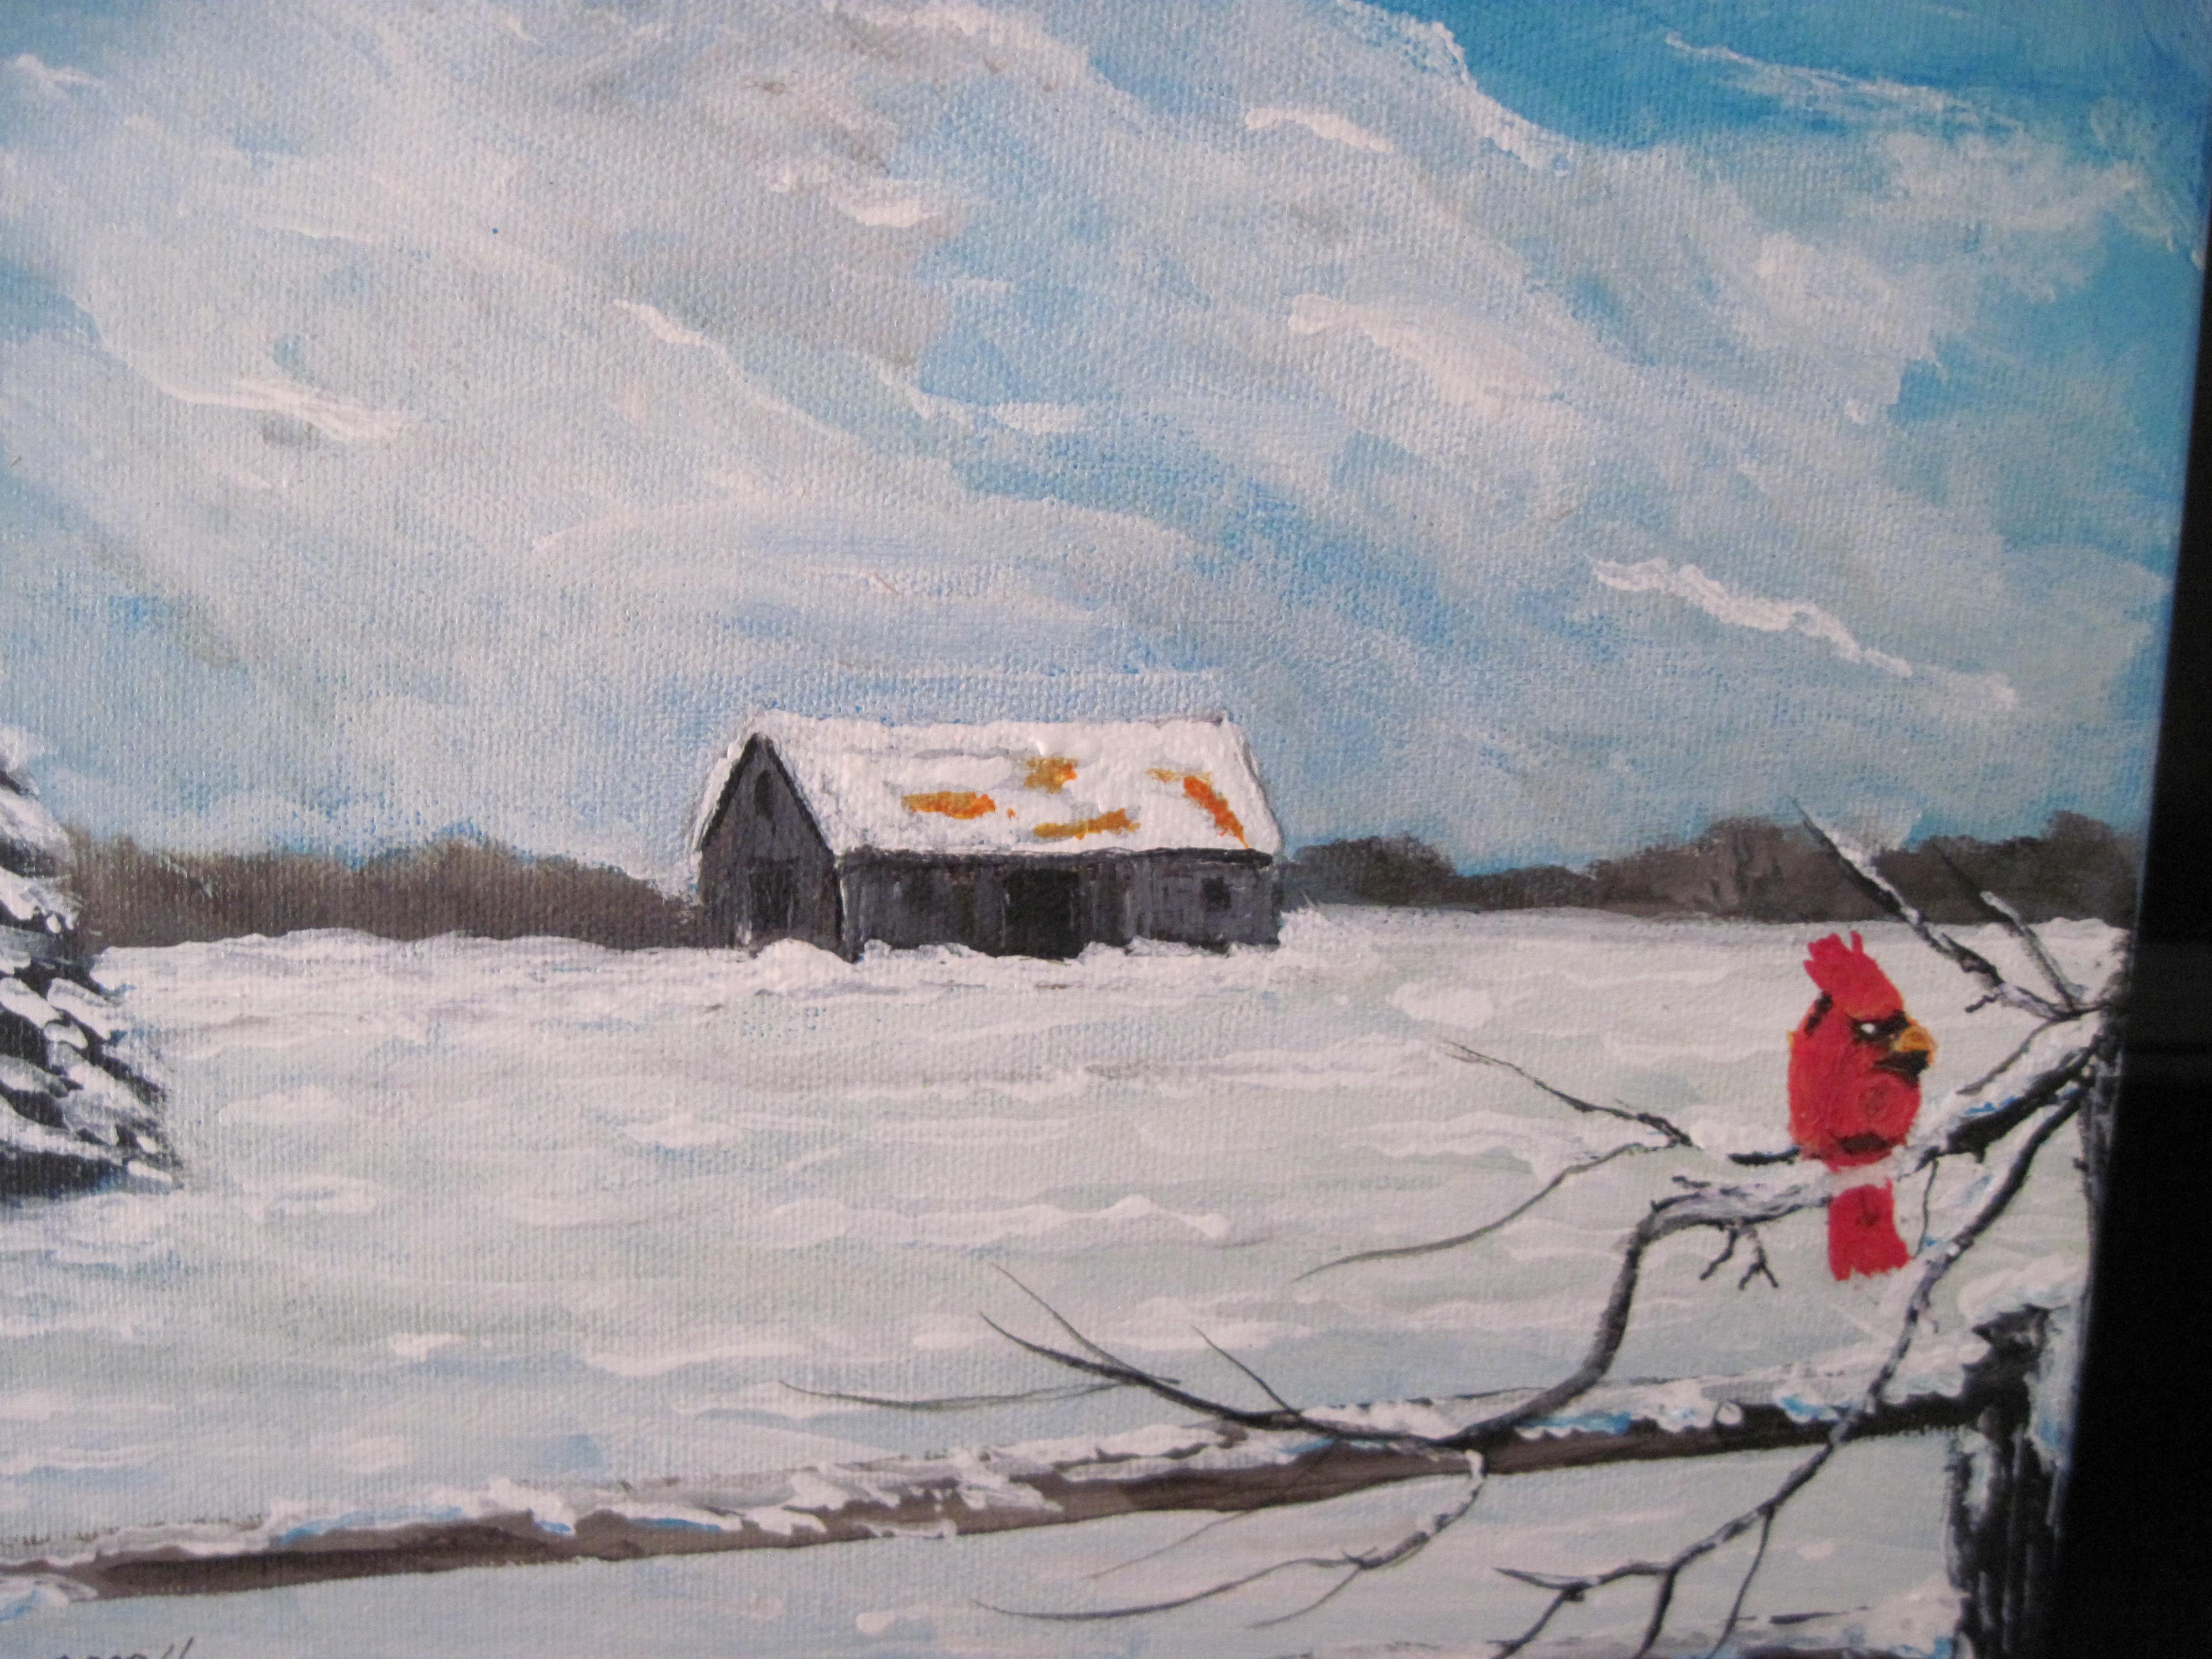 IMG_6752 - Blaine's winter scene with cardinal - 2